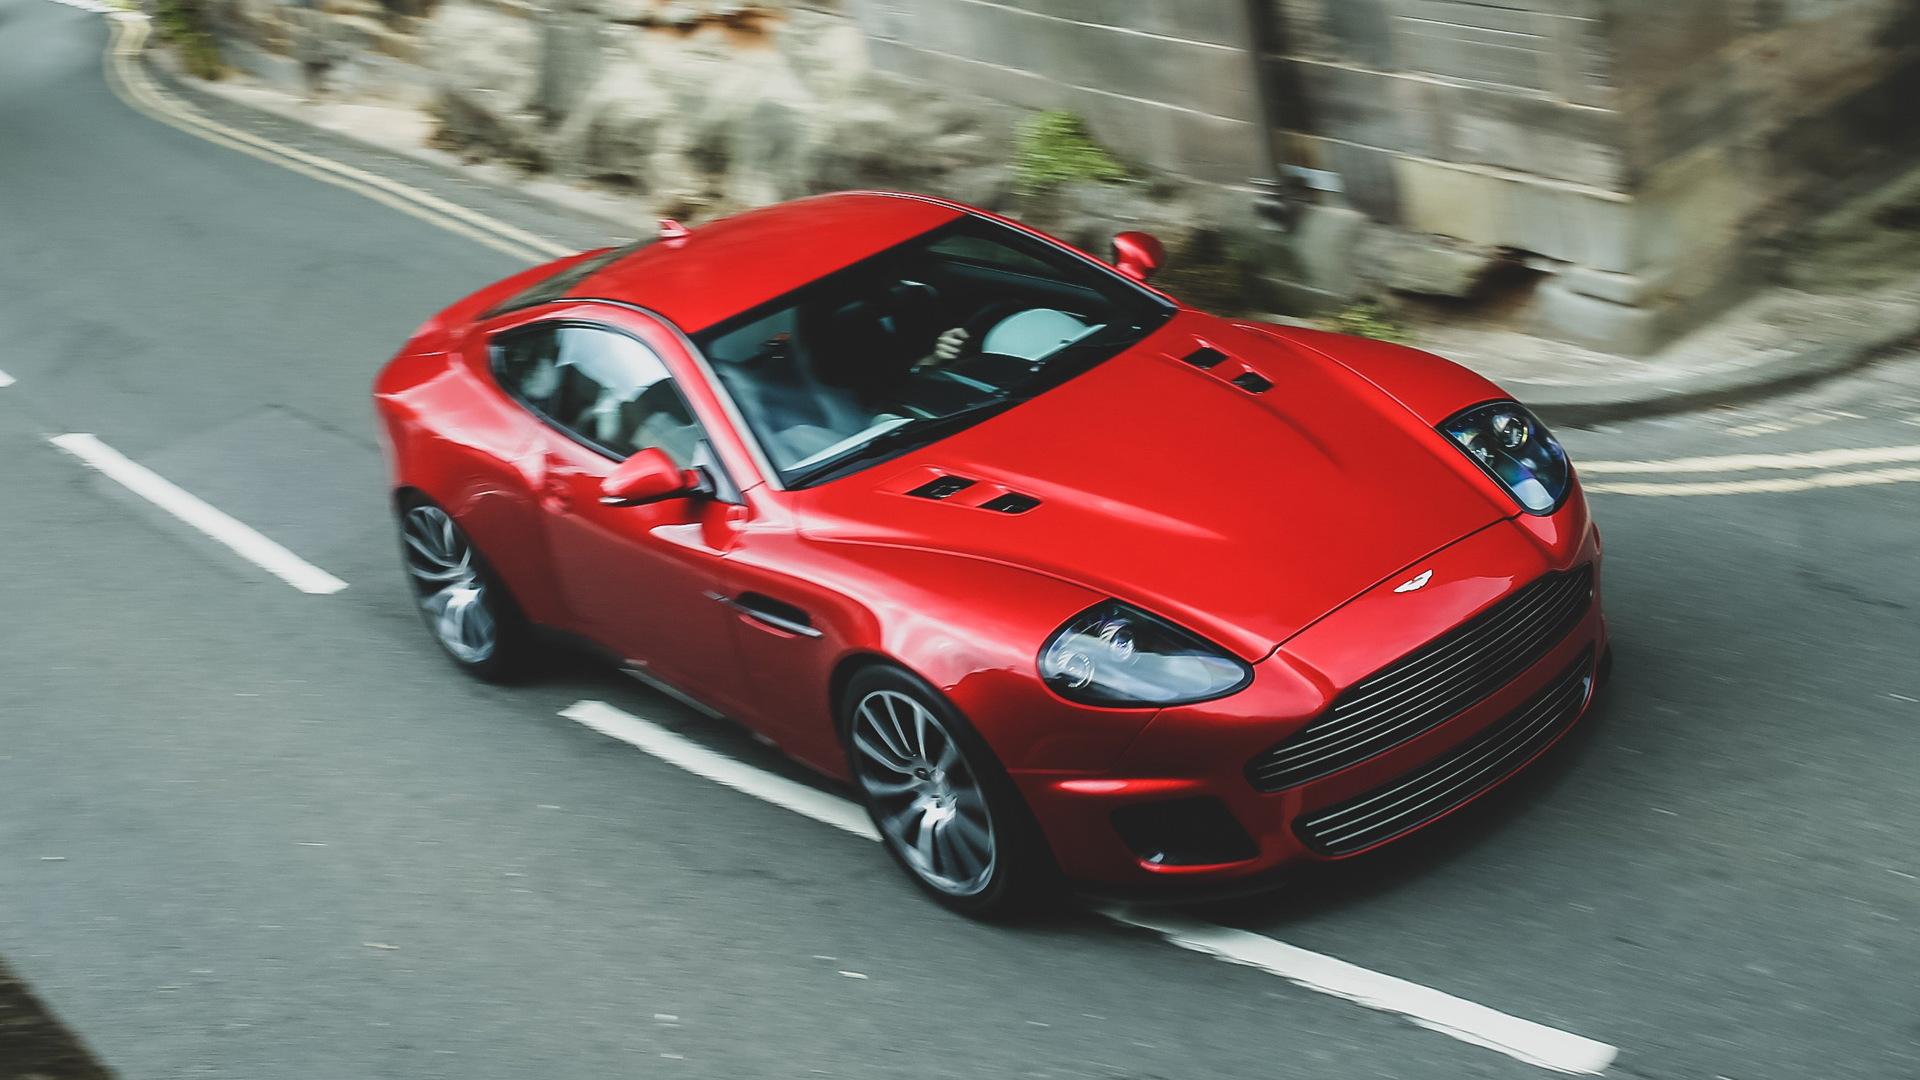 Aston Martin Callum Vanquish 25 by R-Reforged